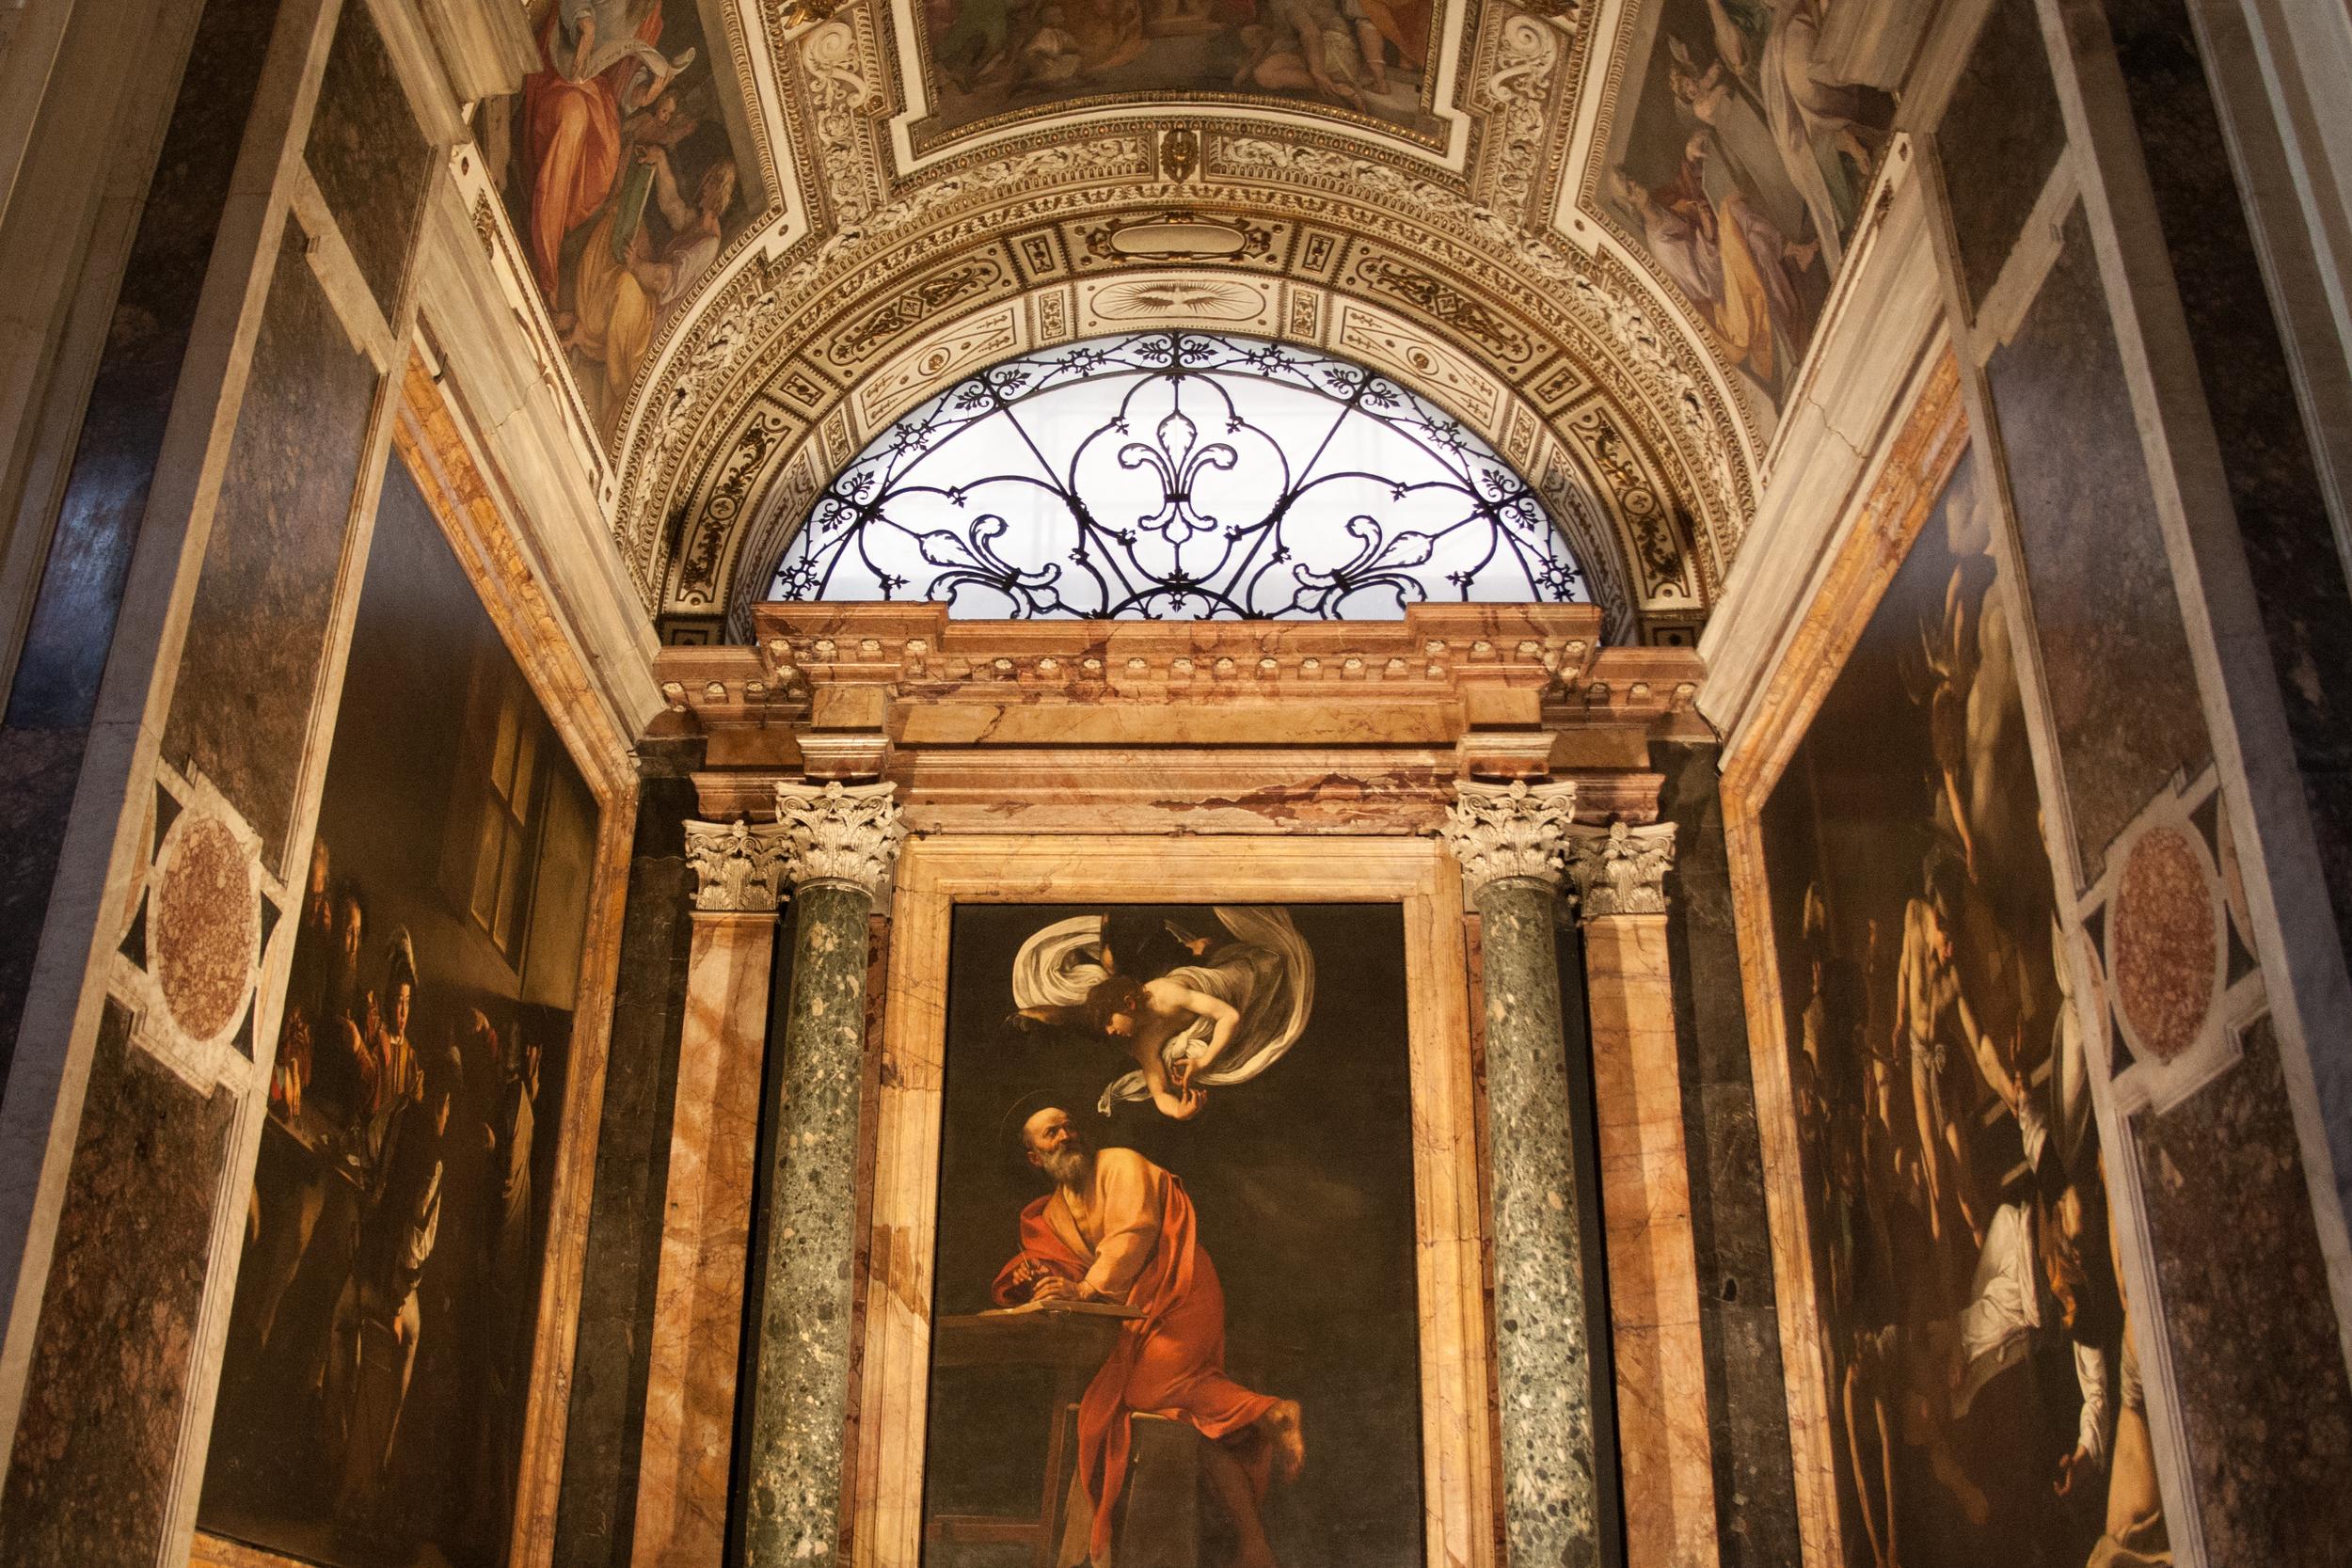 Carravaggio's  The Calling of Saint Matthew  (left),  The Inspiration of Saint Matthew  (center), and  The Martyrdom of Saint Matthew  (right)